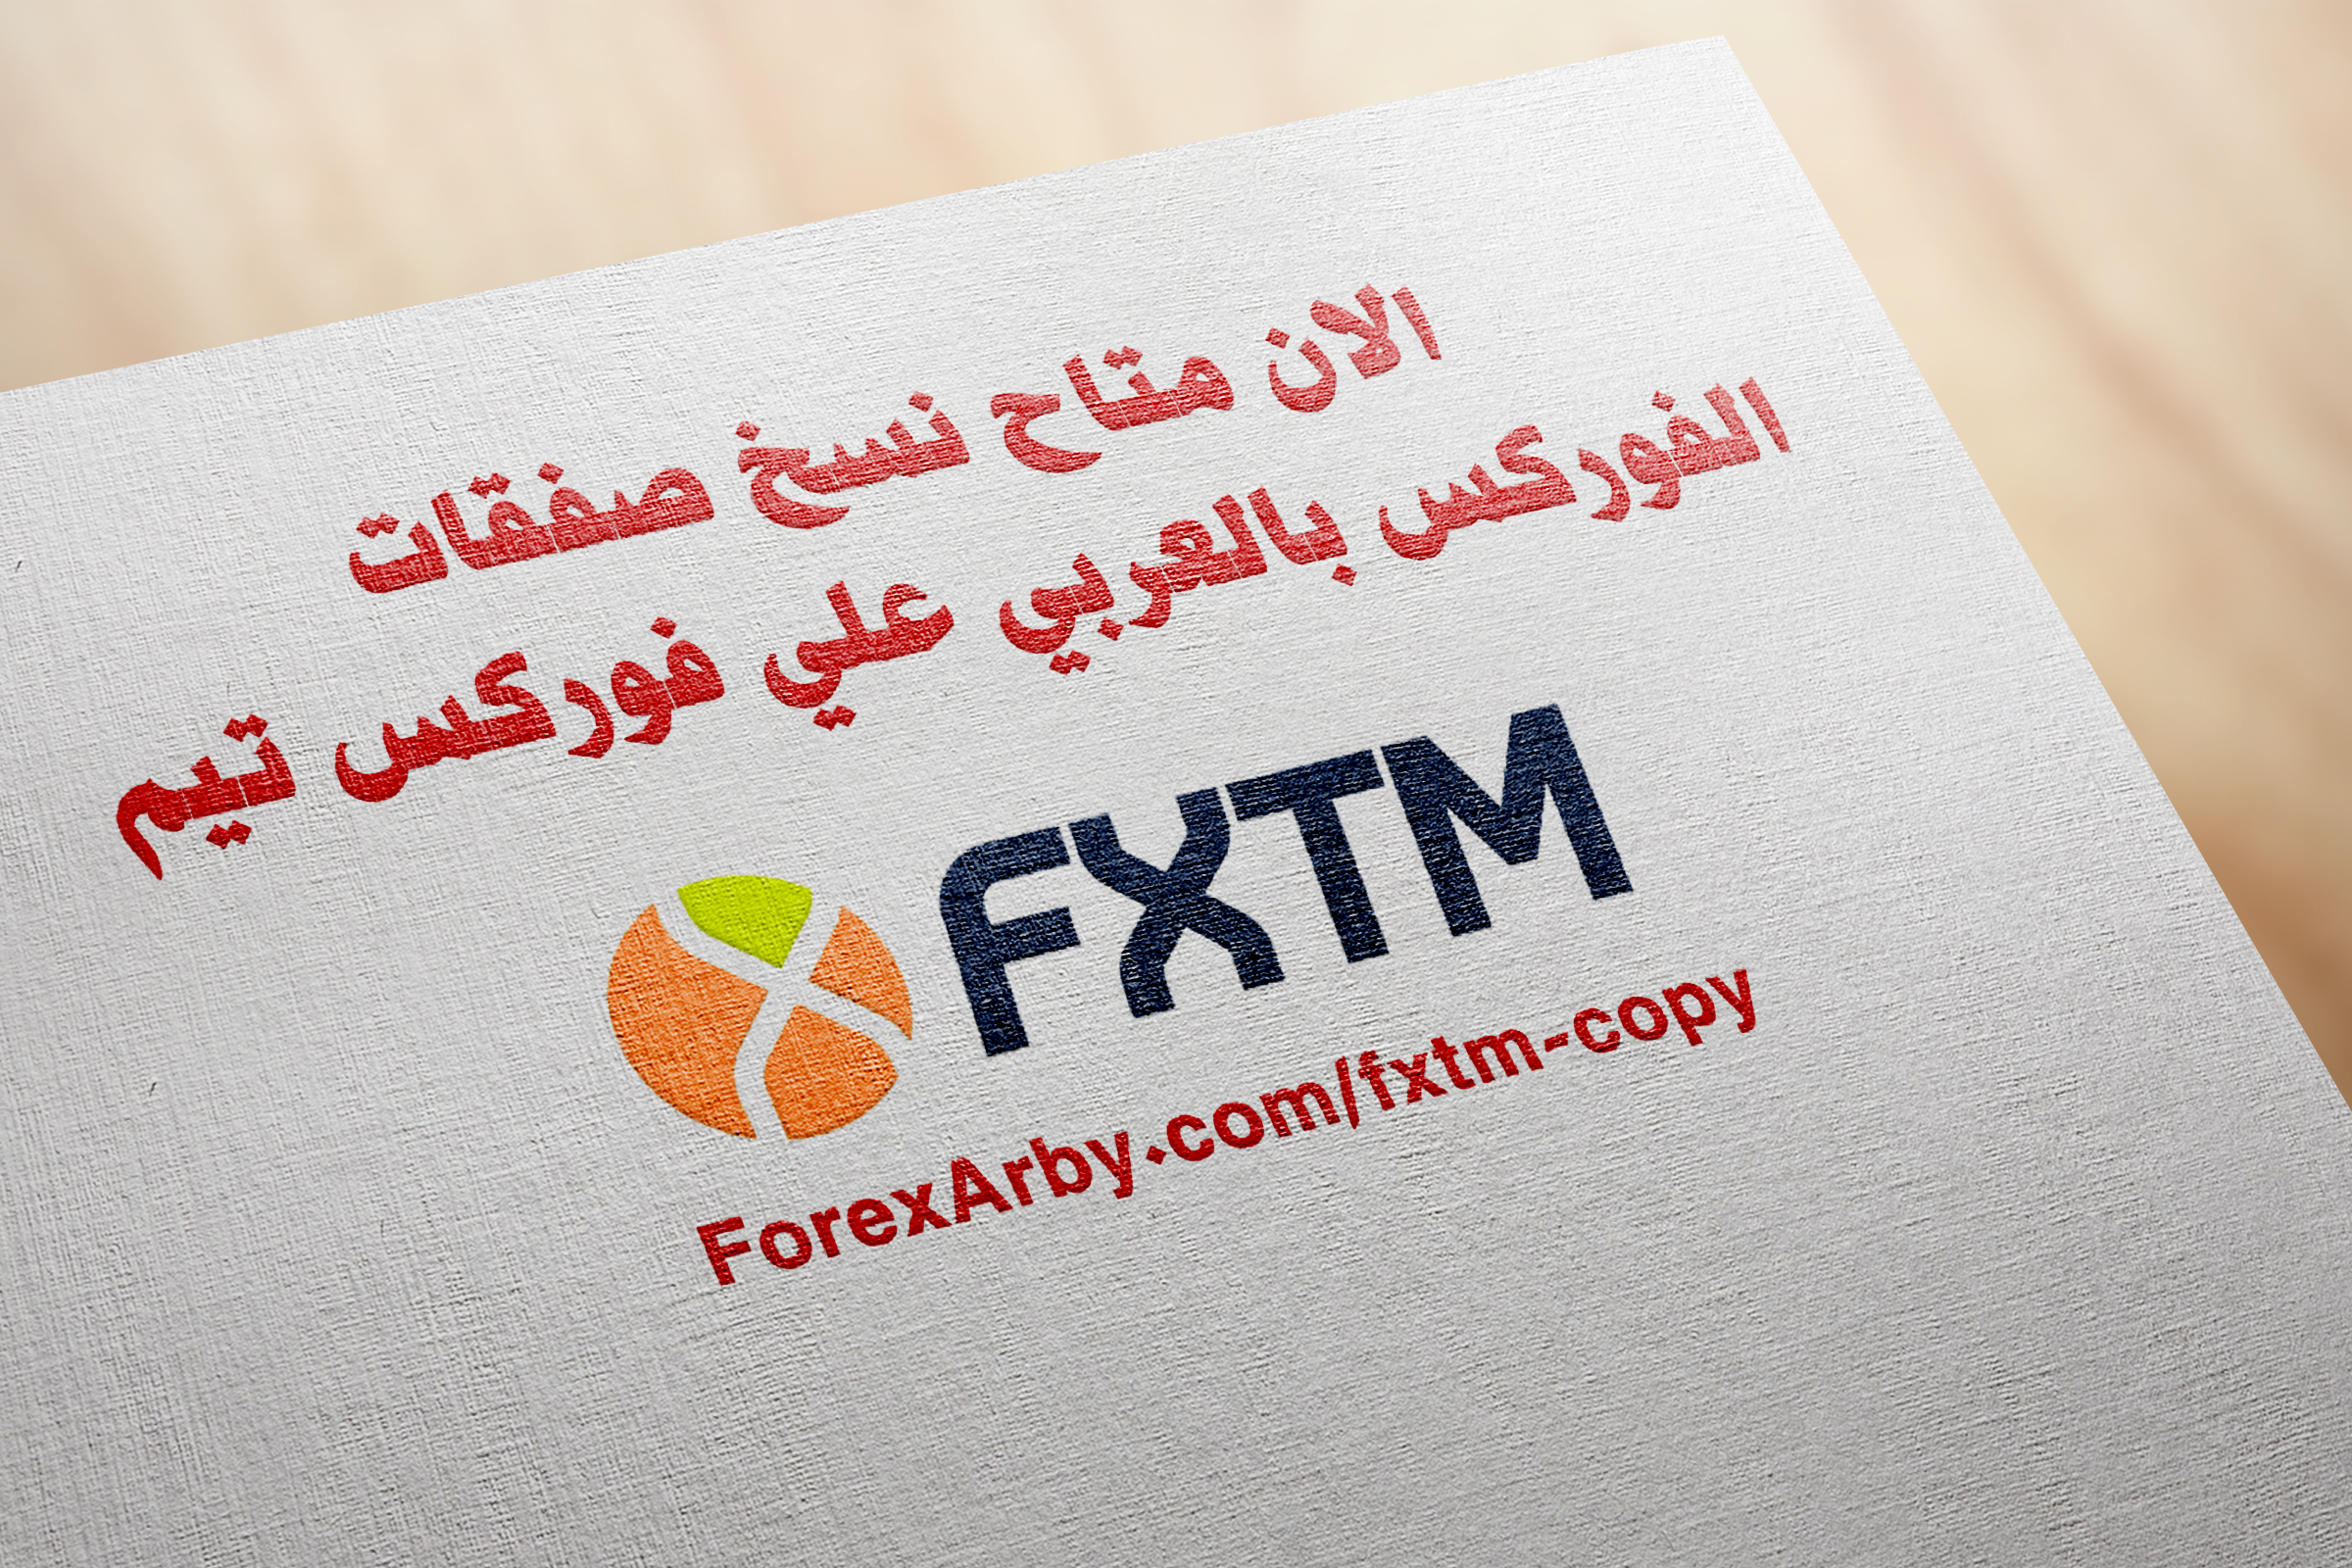 نسخ صفقات الفوركس بالعربي علي فوركس تيم Tech Company Logos Company Logo Supportive